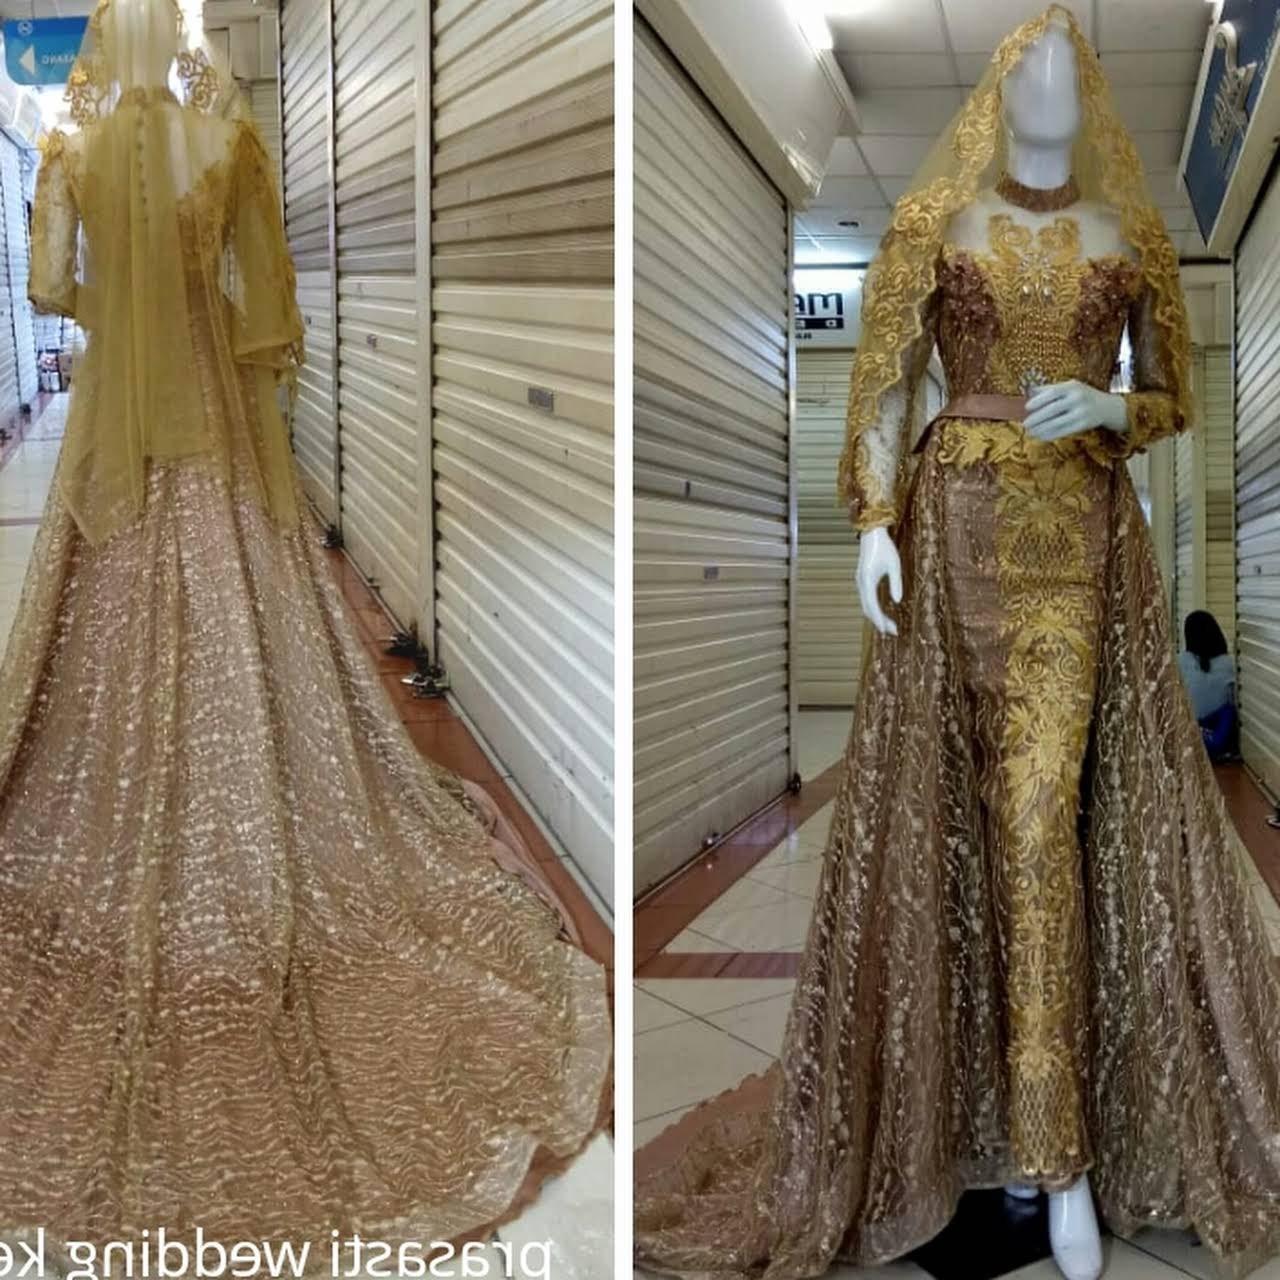 Bentuk Sewa Gaun Pengantin Muslimah Di Bekasi 9ddf Gaun Kebaya Pengantin Muslimah Hijab Syari Layanan Belanja